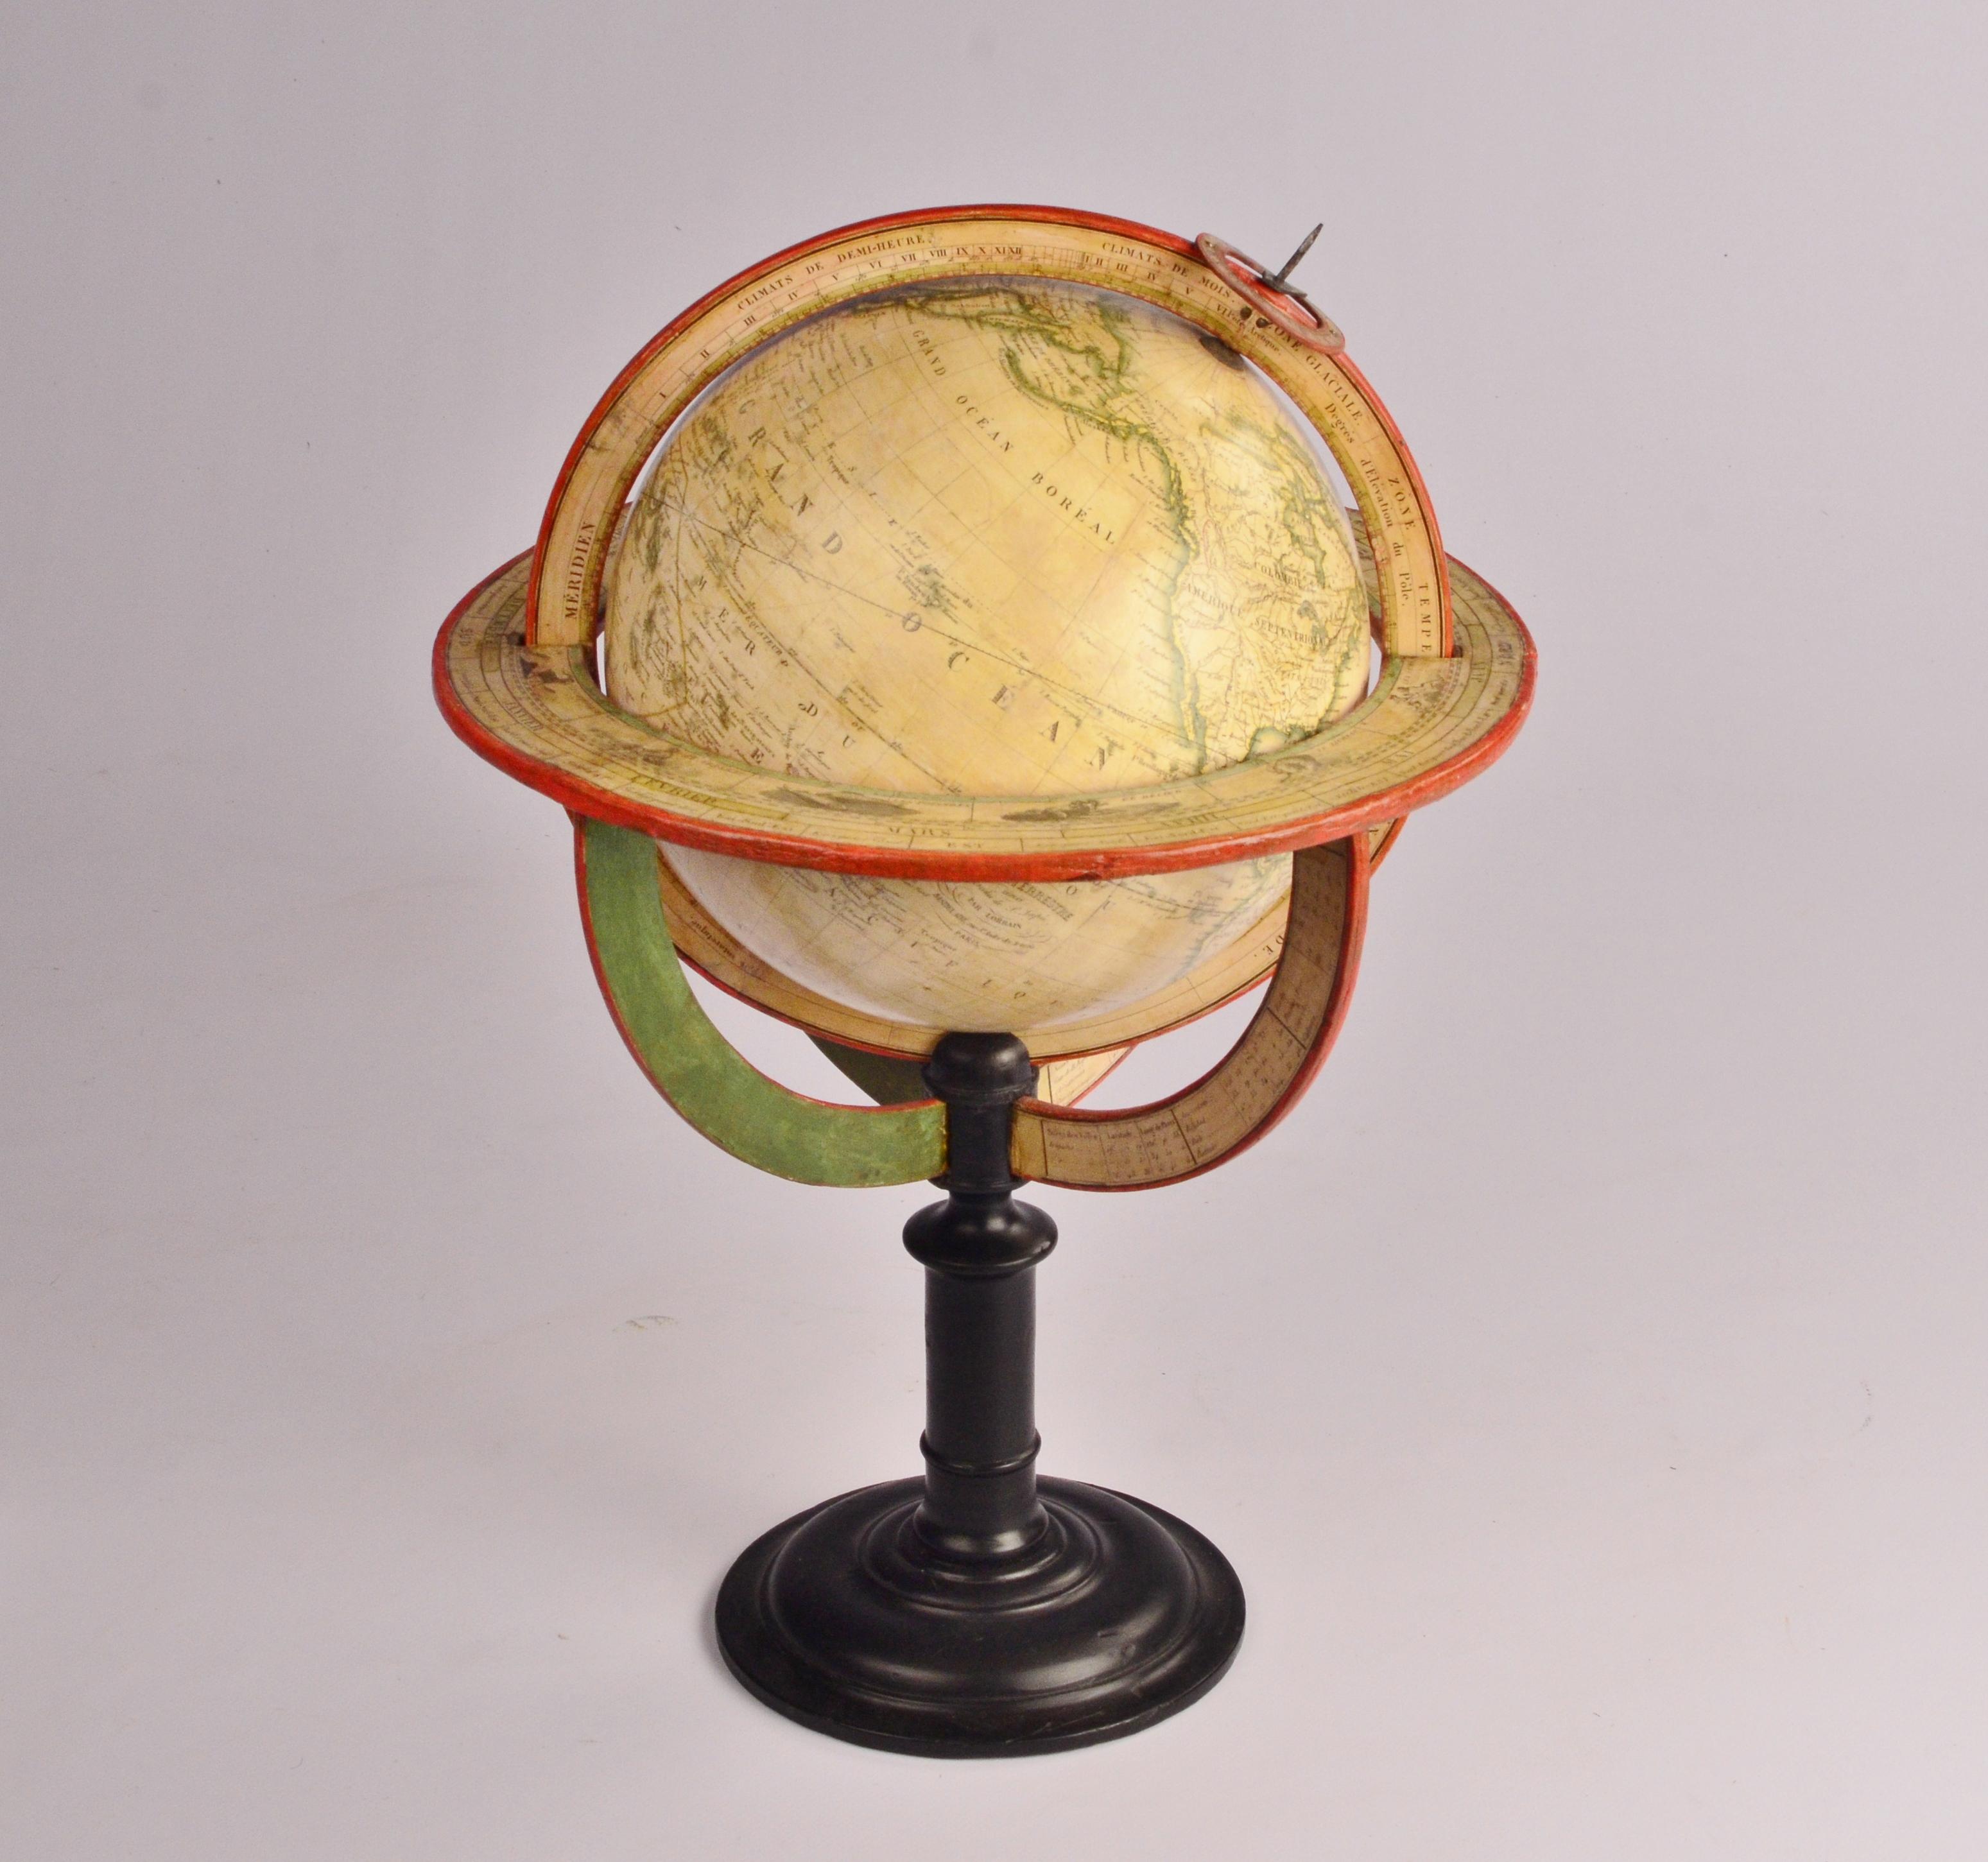 Interesting Terrestrial Table Globe of paper mache – P. Lapie/Lorrain, ca. 1840